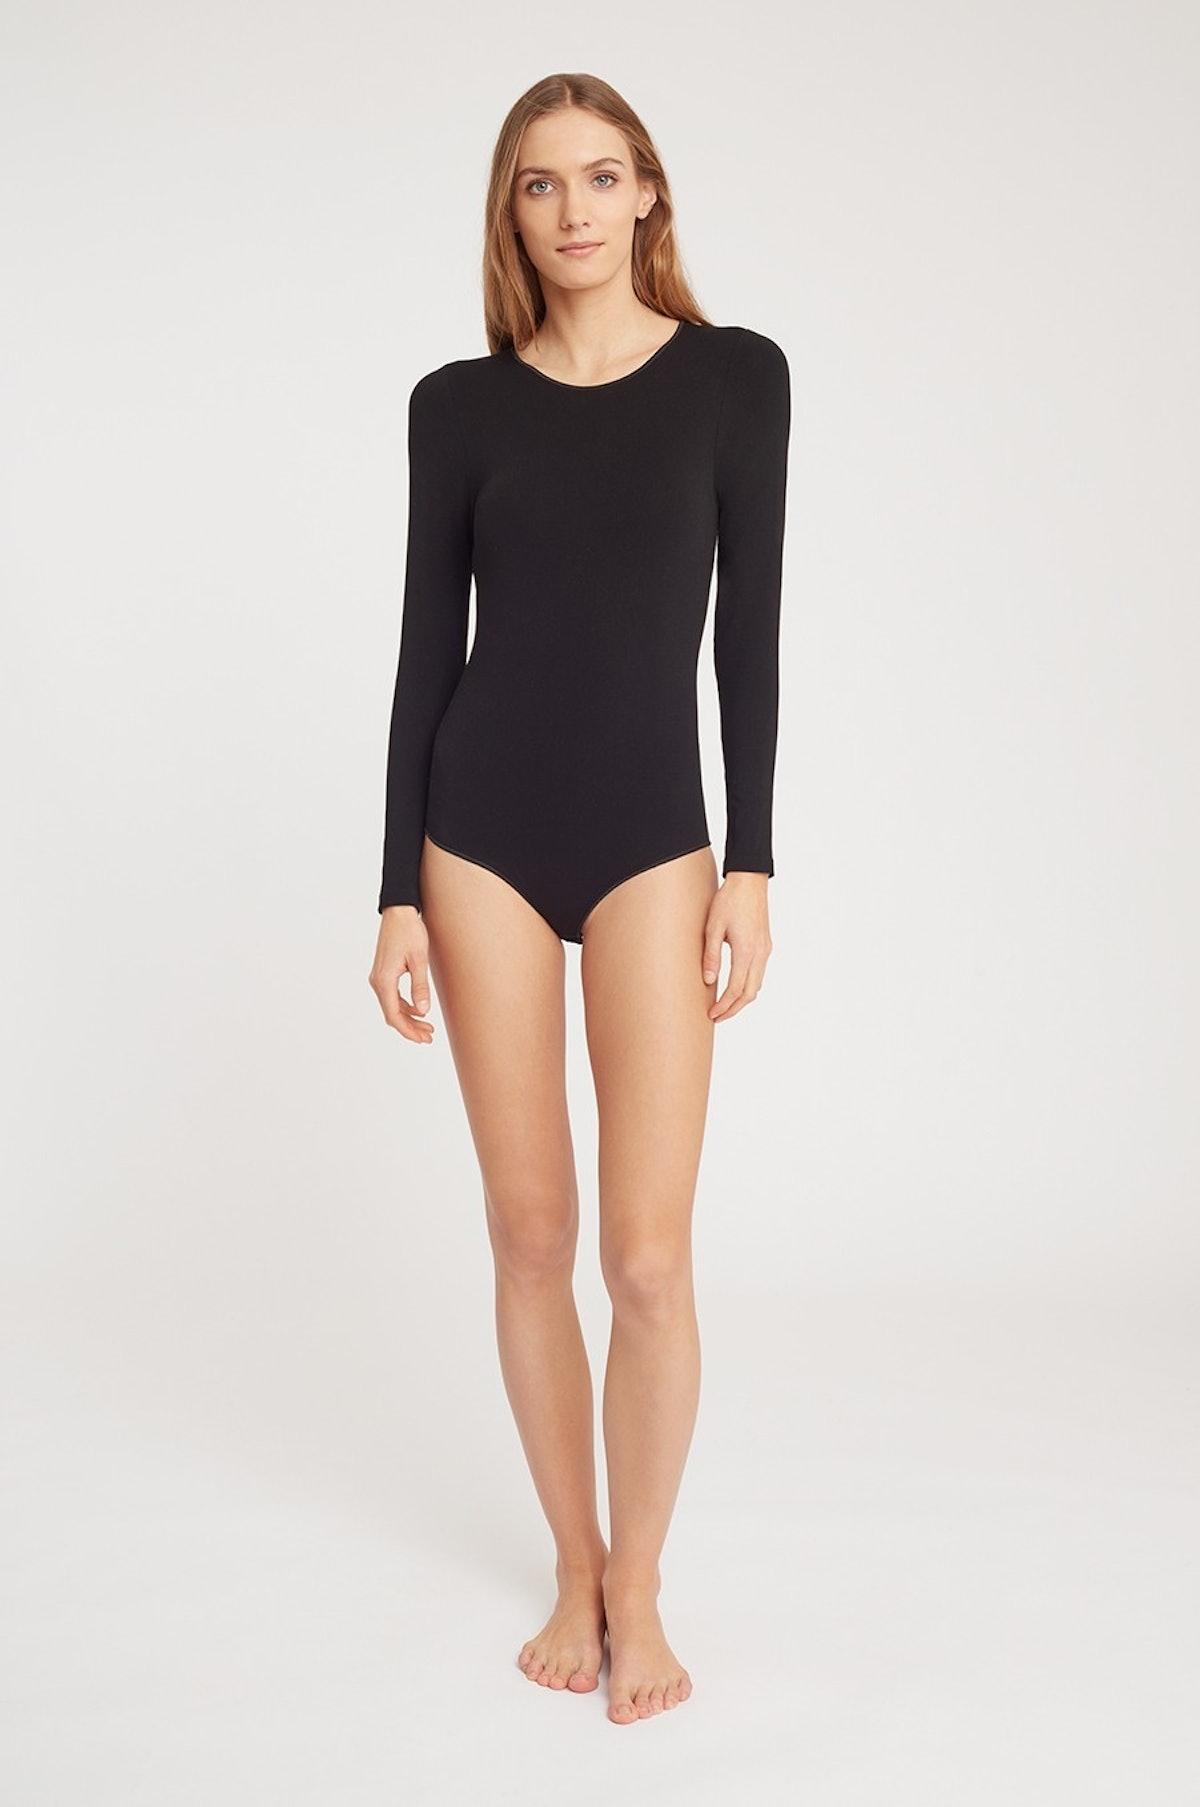 Seamless Long Sleeve Bodysuit